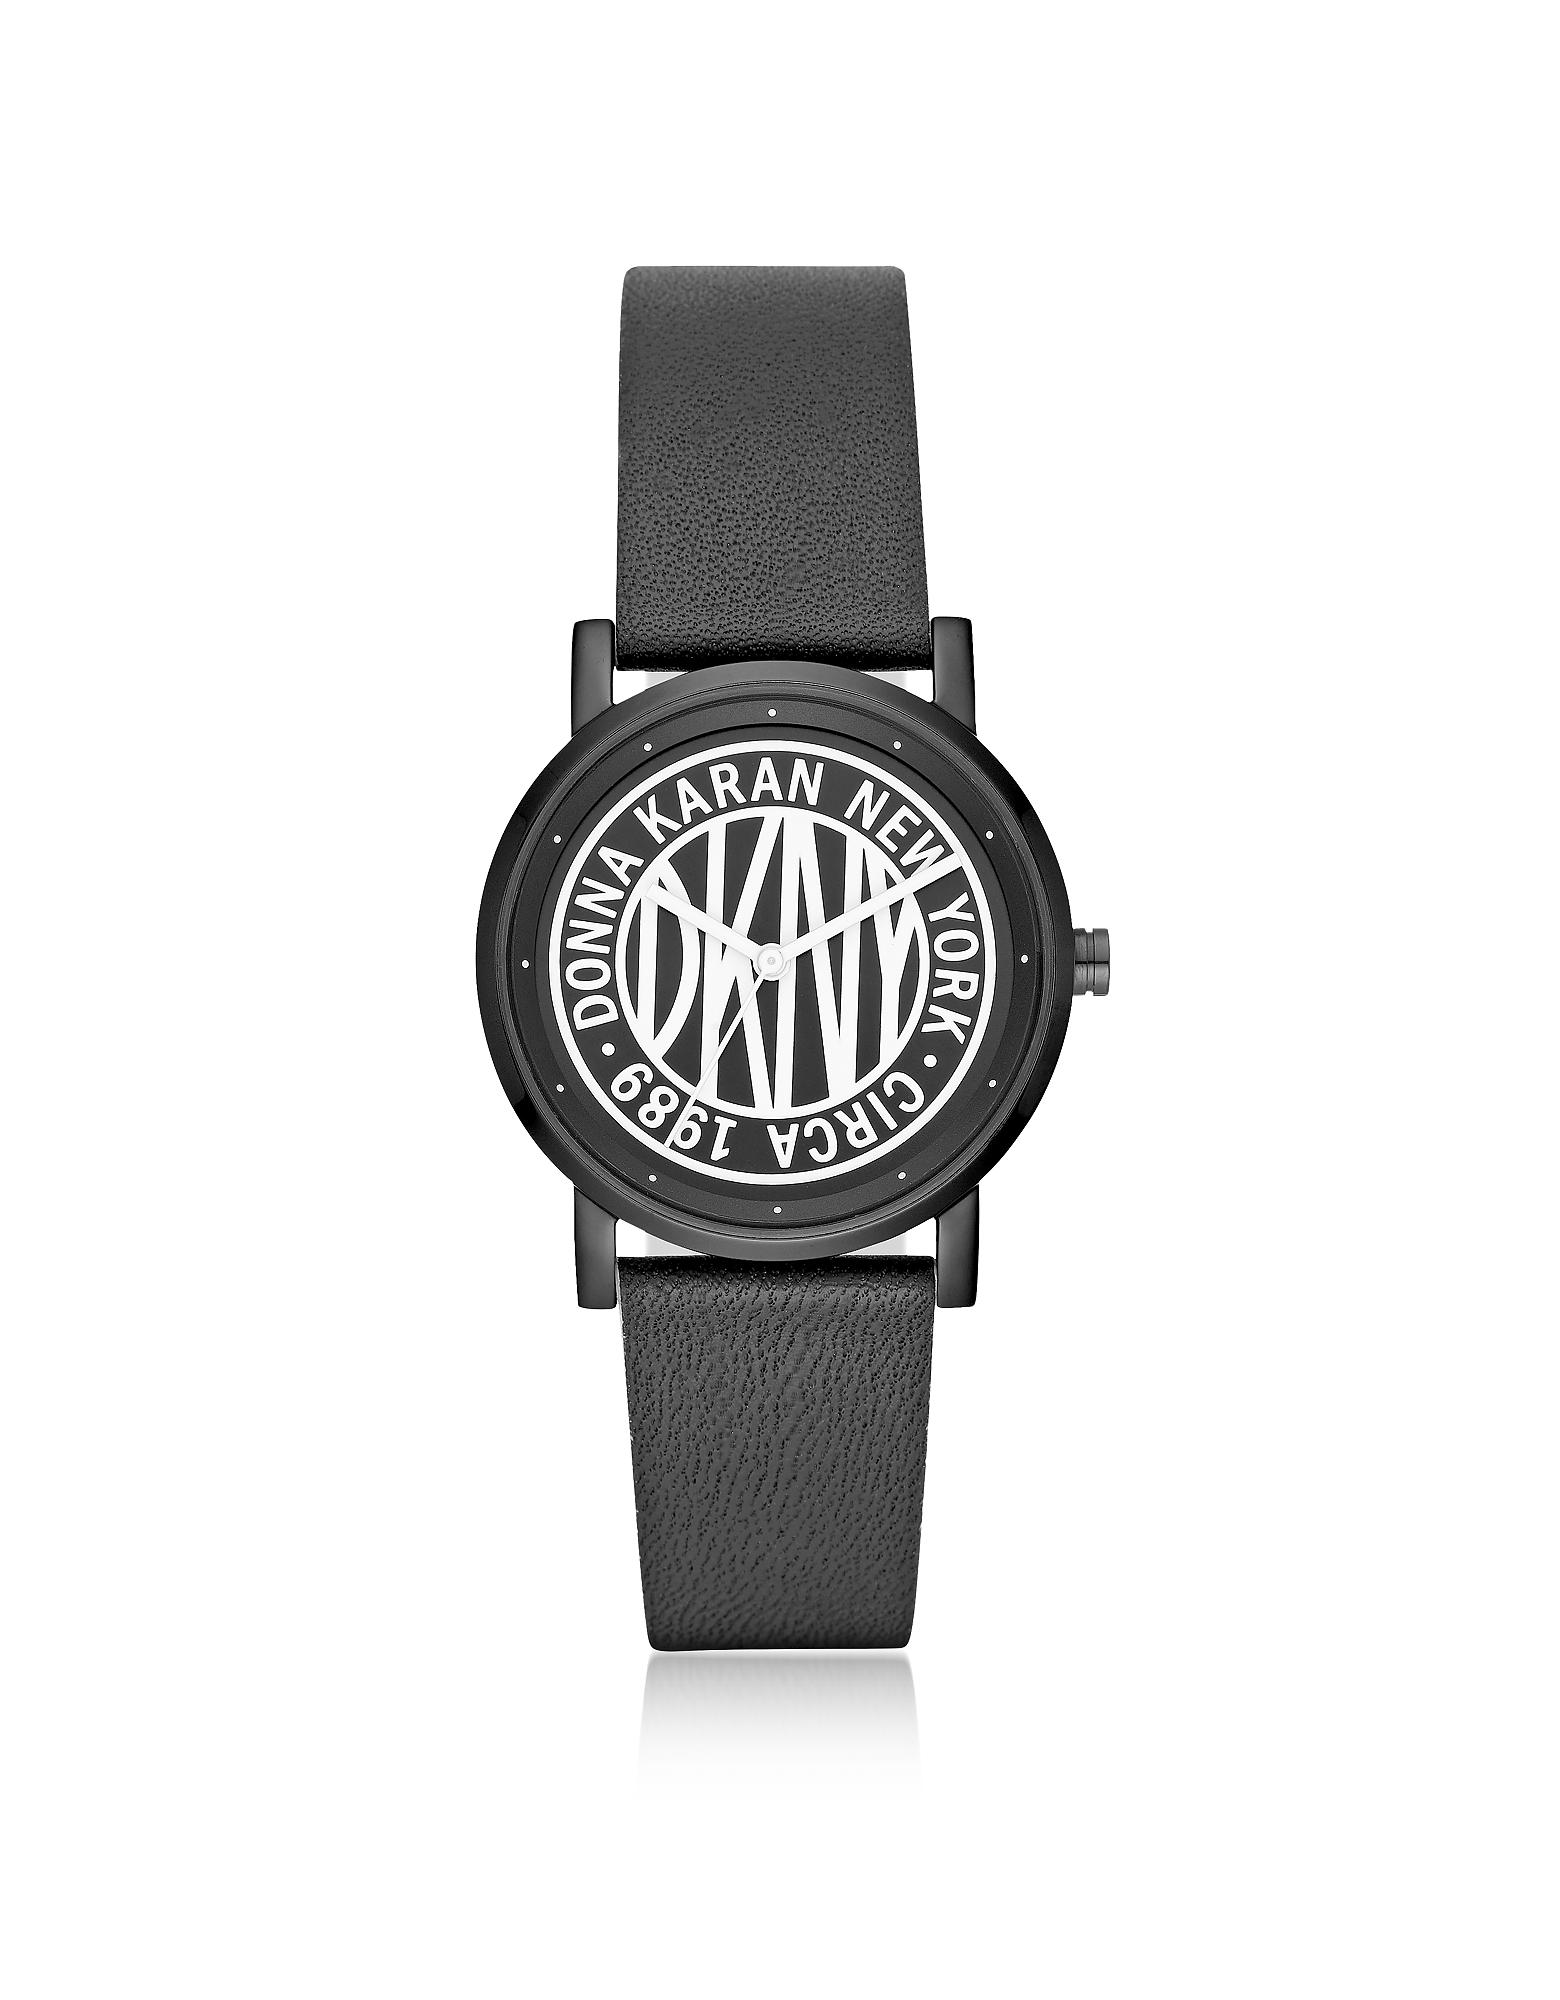 DKNY Women's Watches, Soho Black Leather Women's Watch